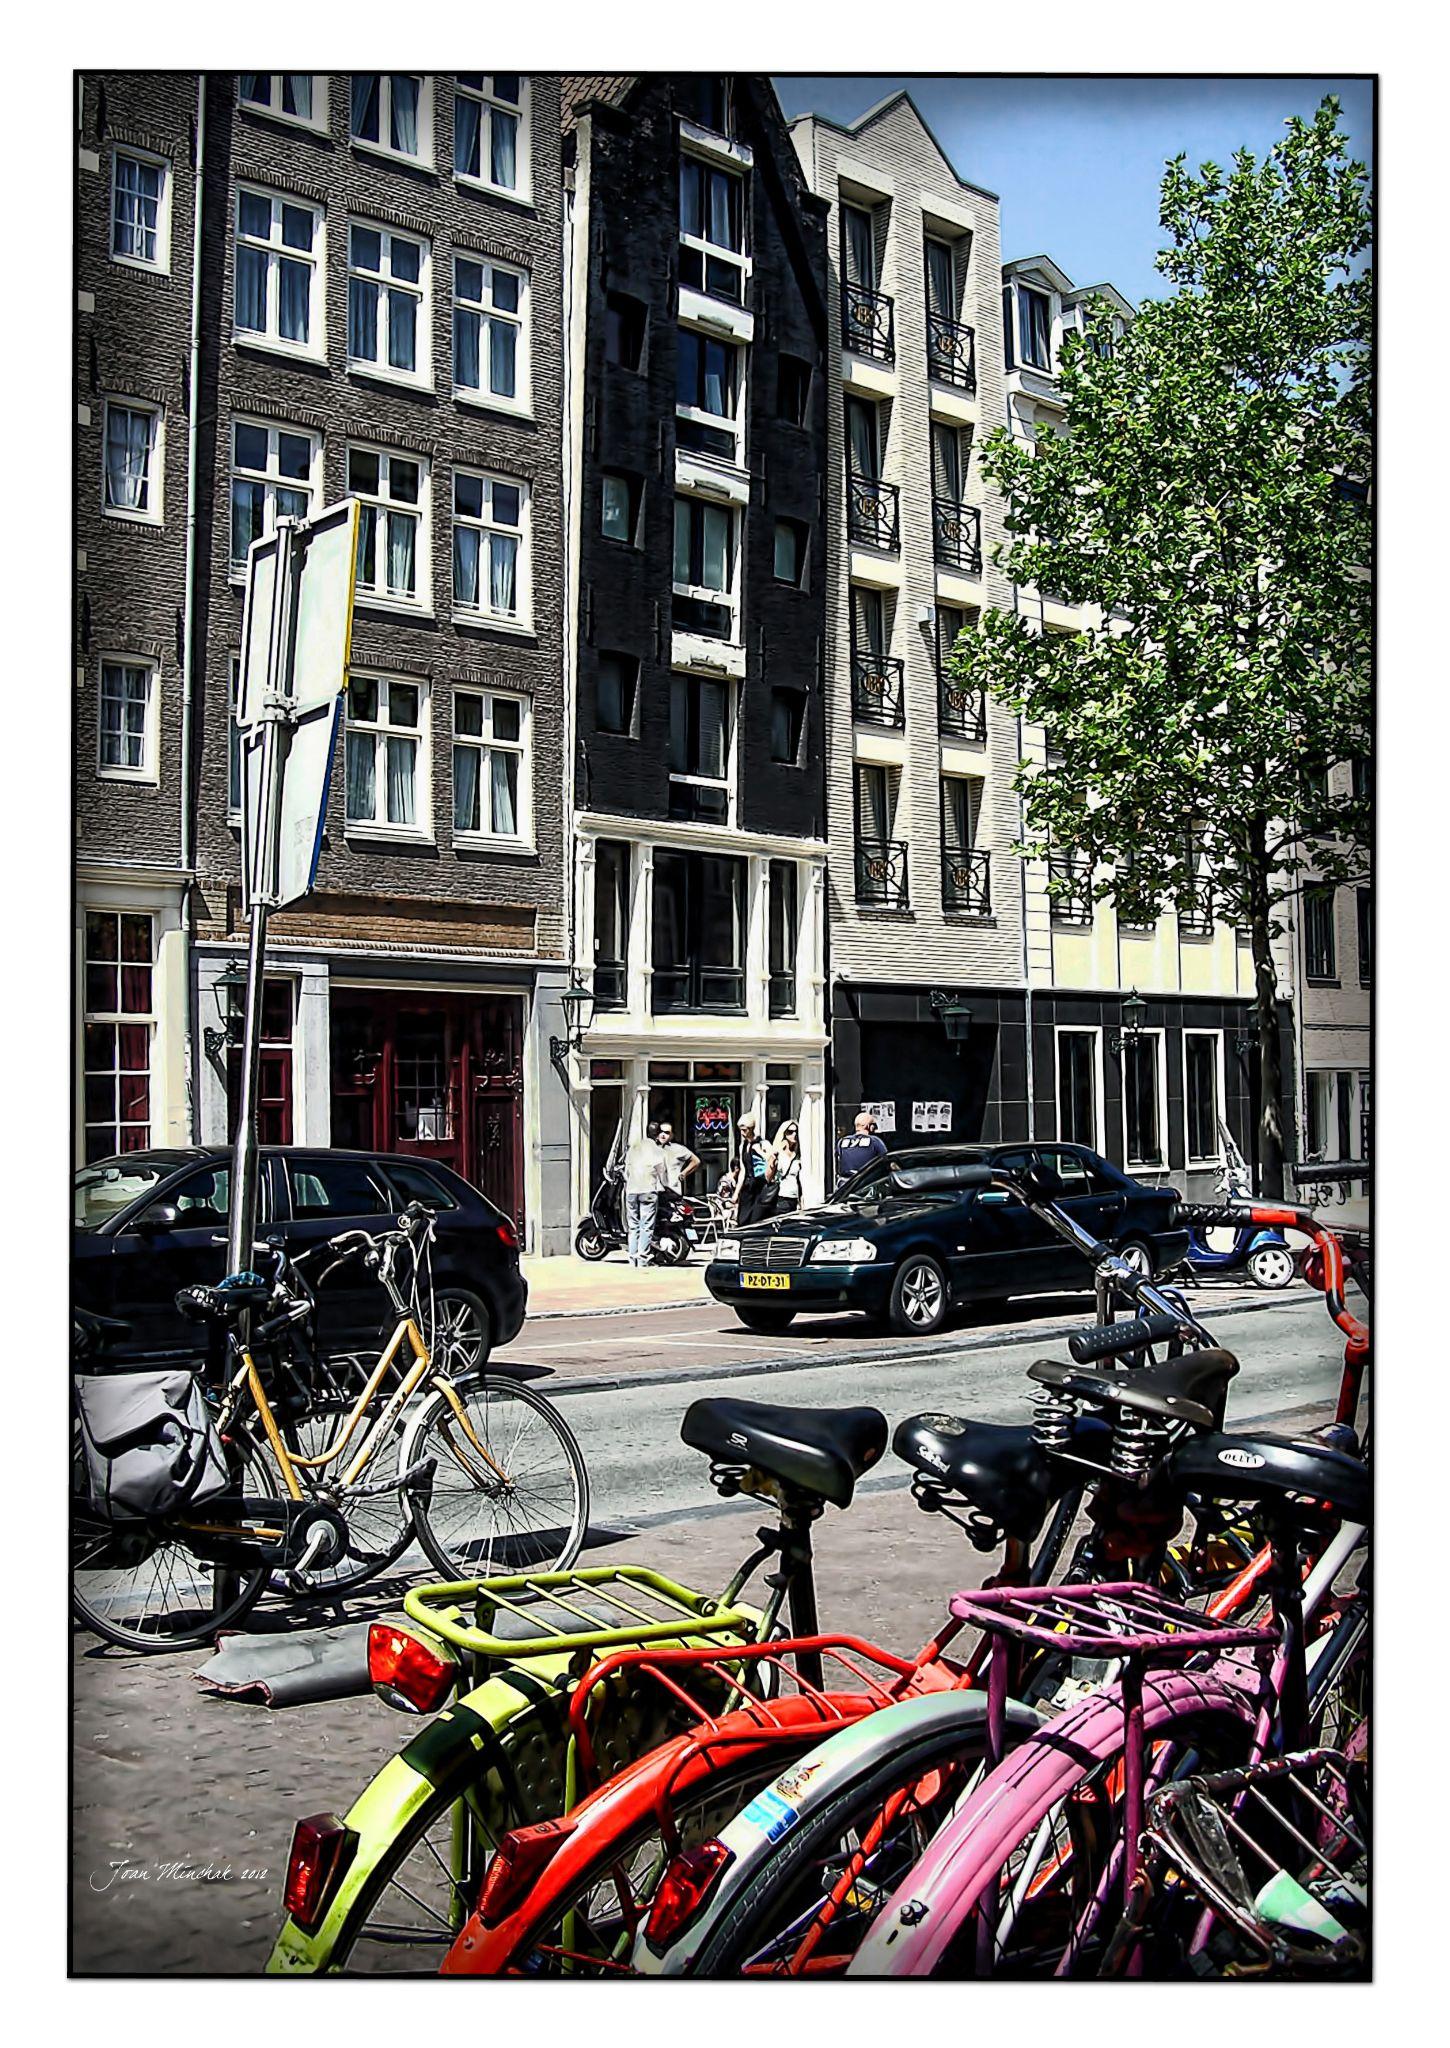 Bikes and Amsterdam by jminchak